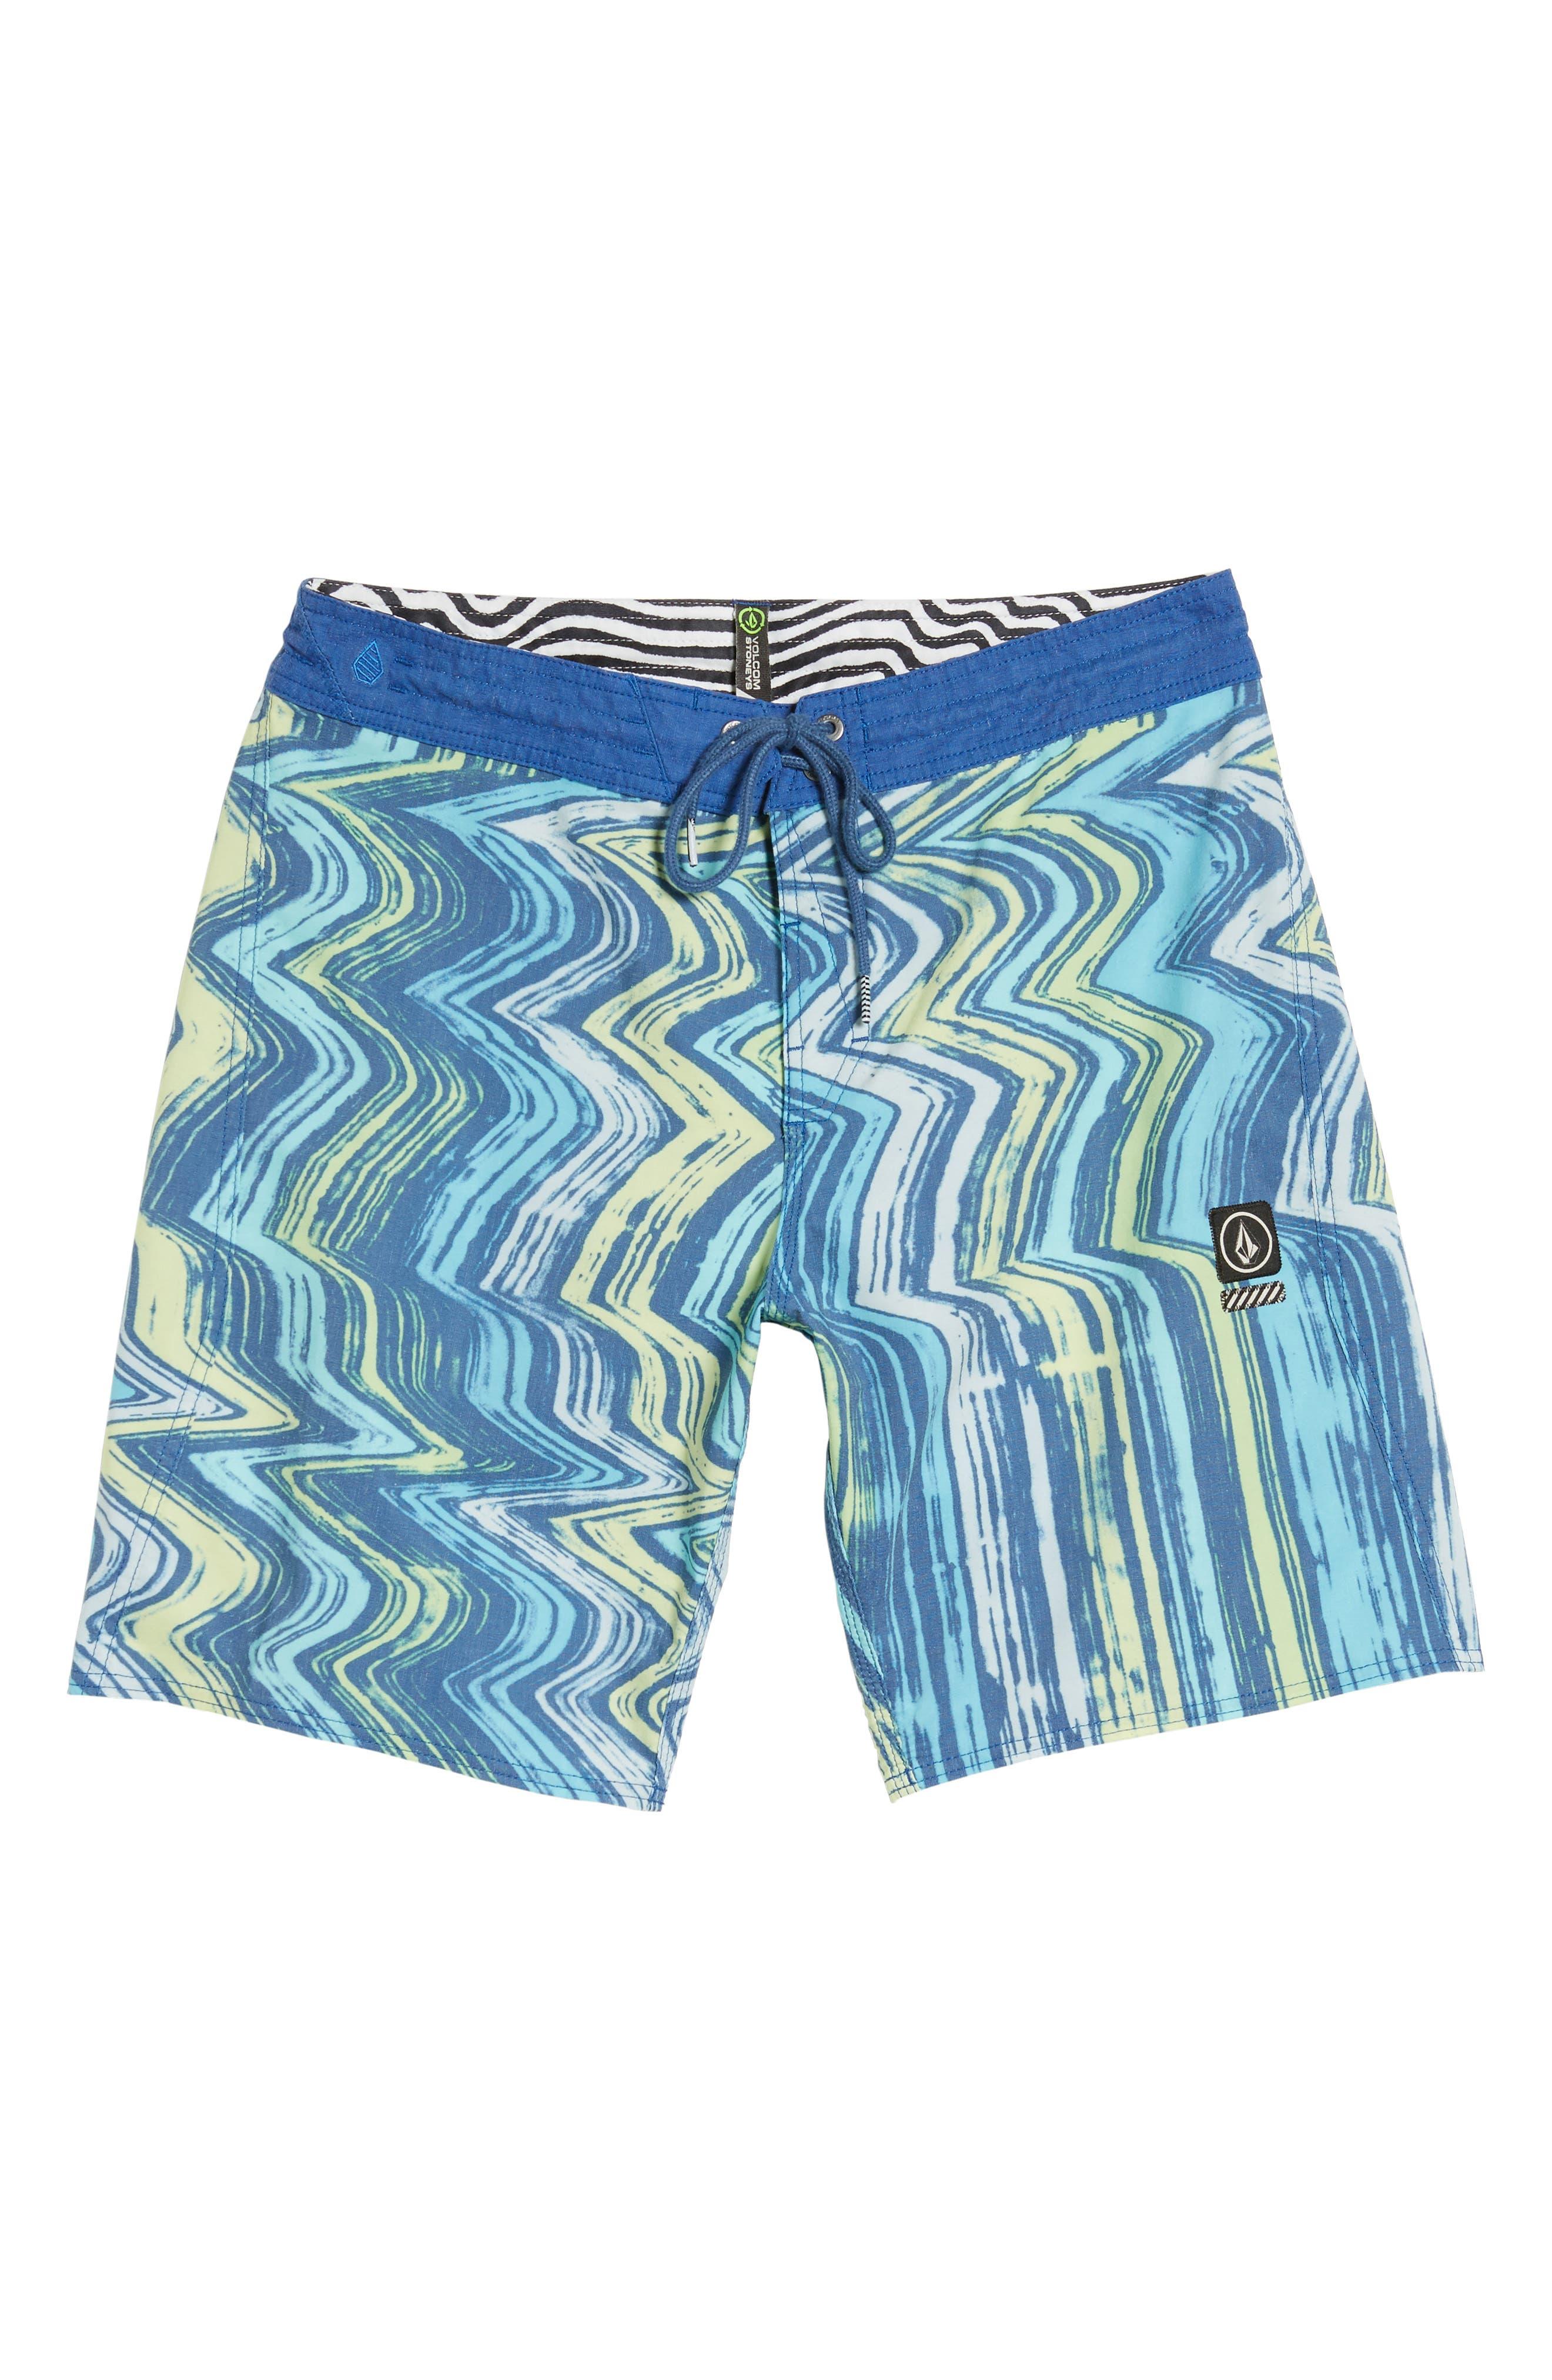 Lo-Fi Stoney Board Shorts,                             Alternate thumbnail 48, color,